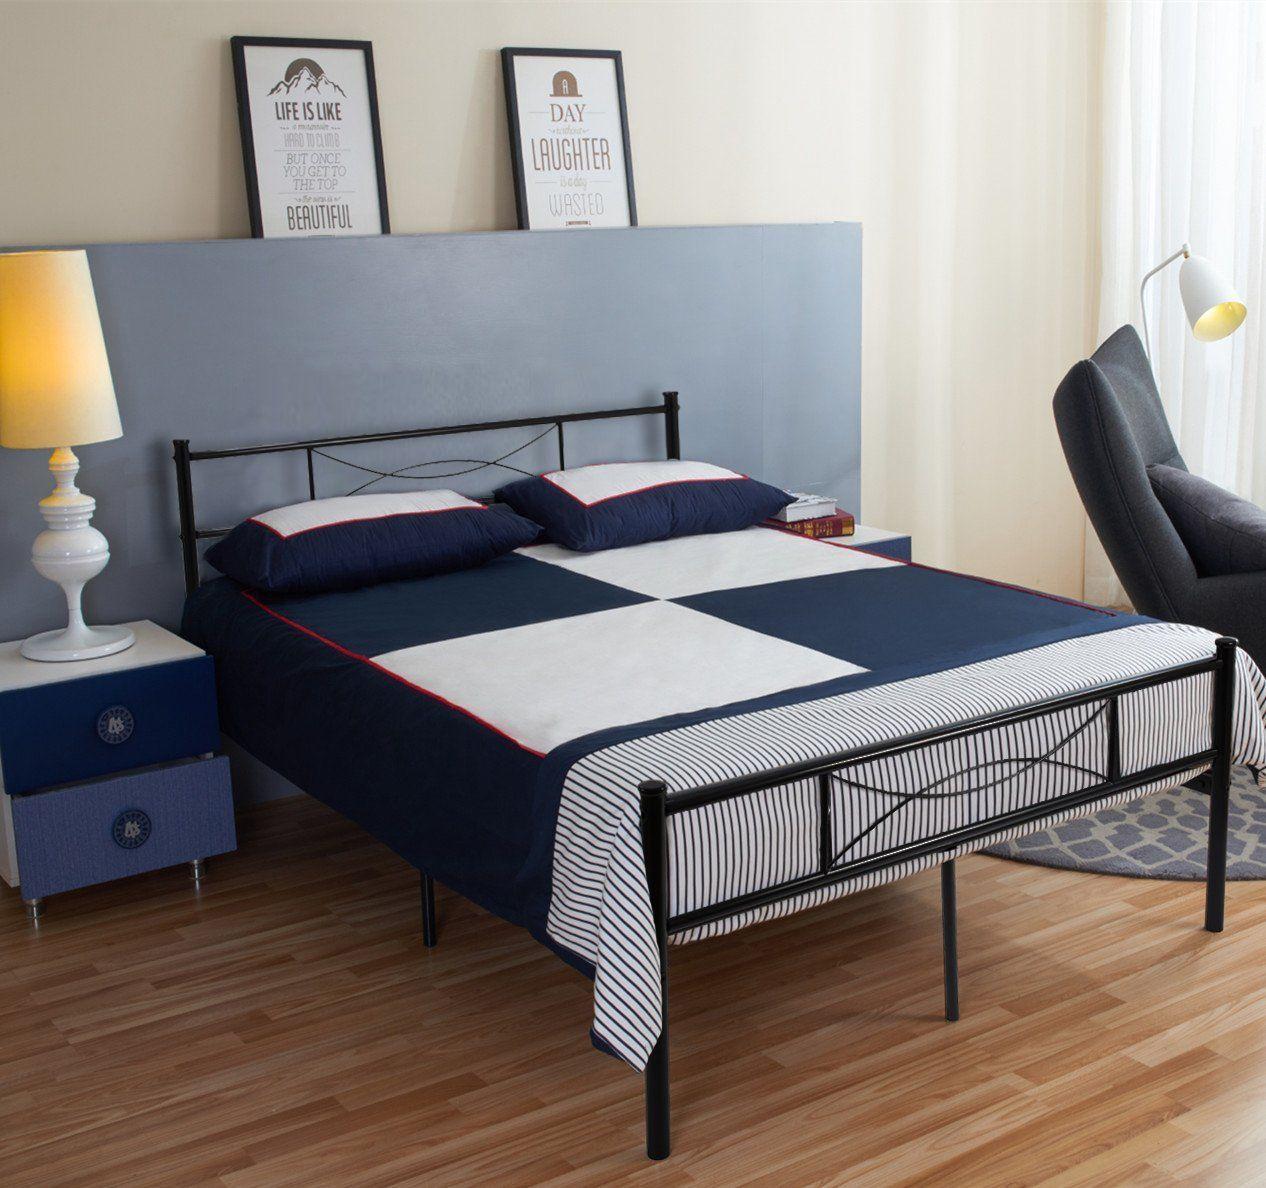 Simlife Metal Bed Frame Full Size 10 Legs Two Headboards Mattress